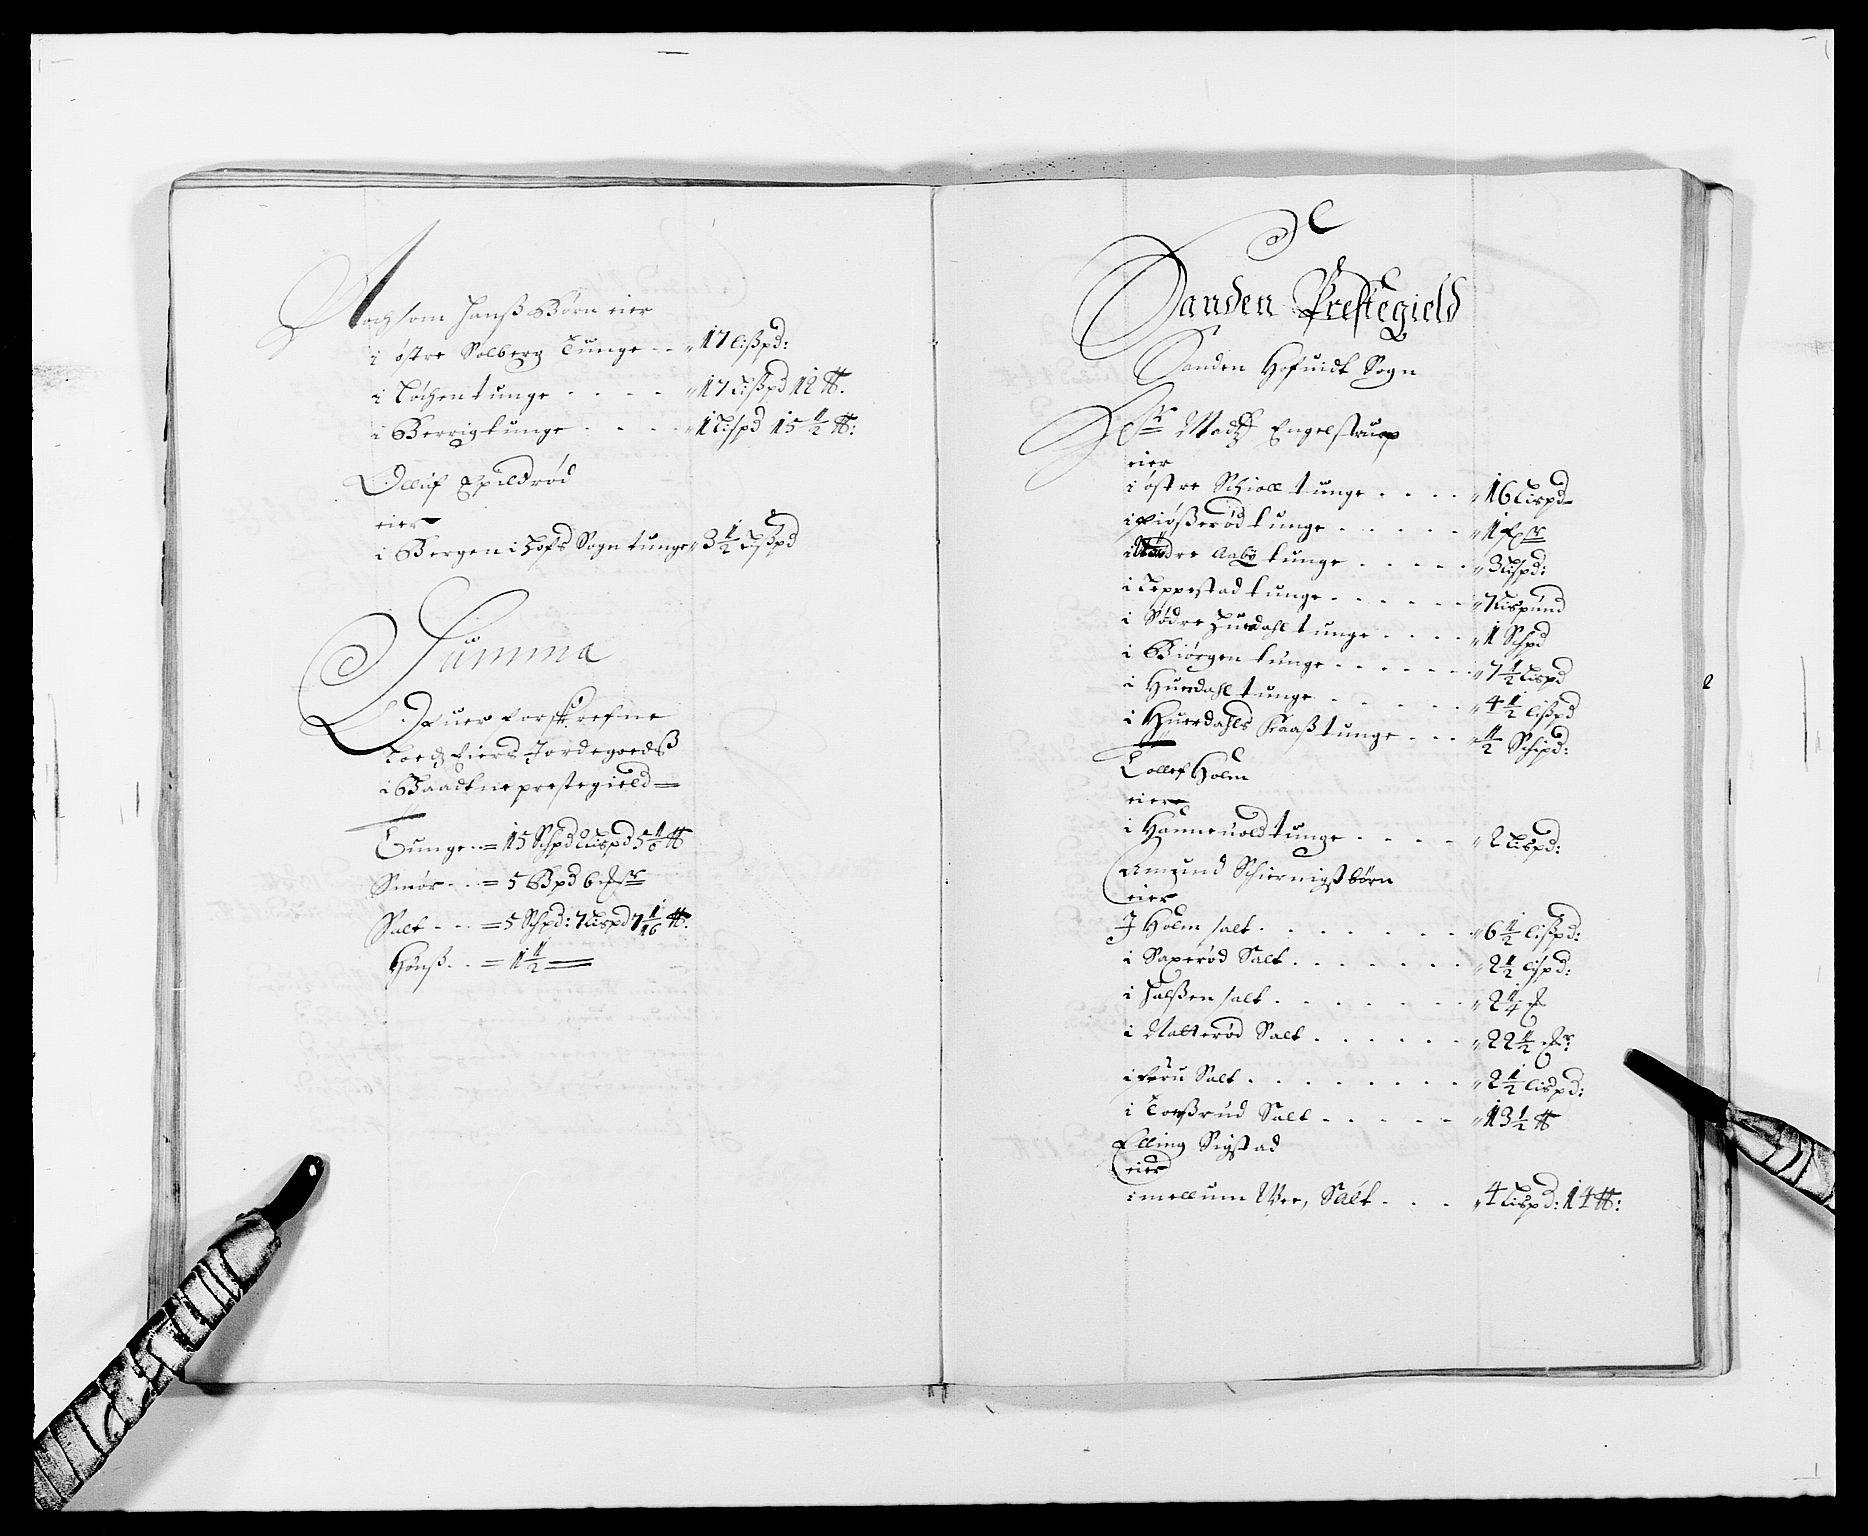 RA, Rentekammeret inntil 1814, Reviderte regnskaper, Fogderegnskap, R32/L1857: Fogderegnskap Jarlsberg grevskap, 1686-1690, s. 216